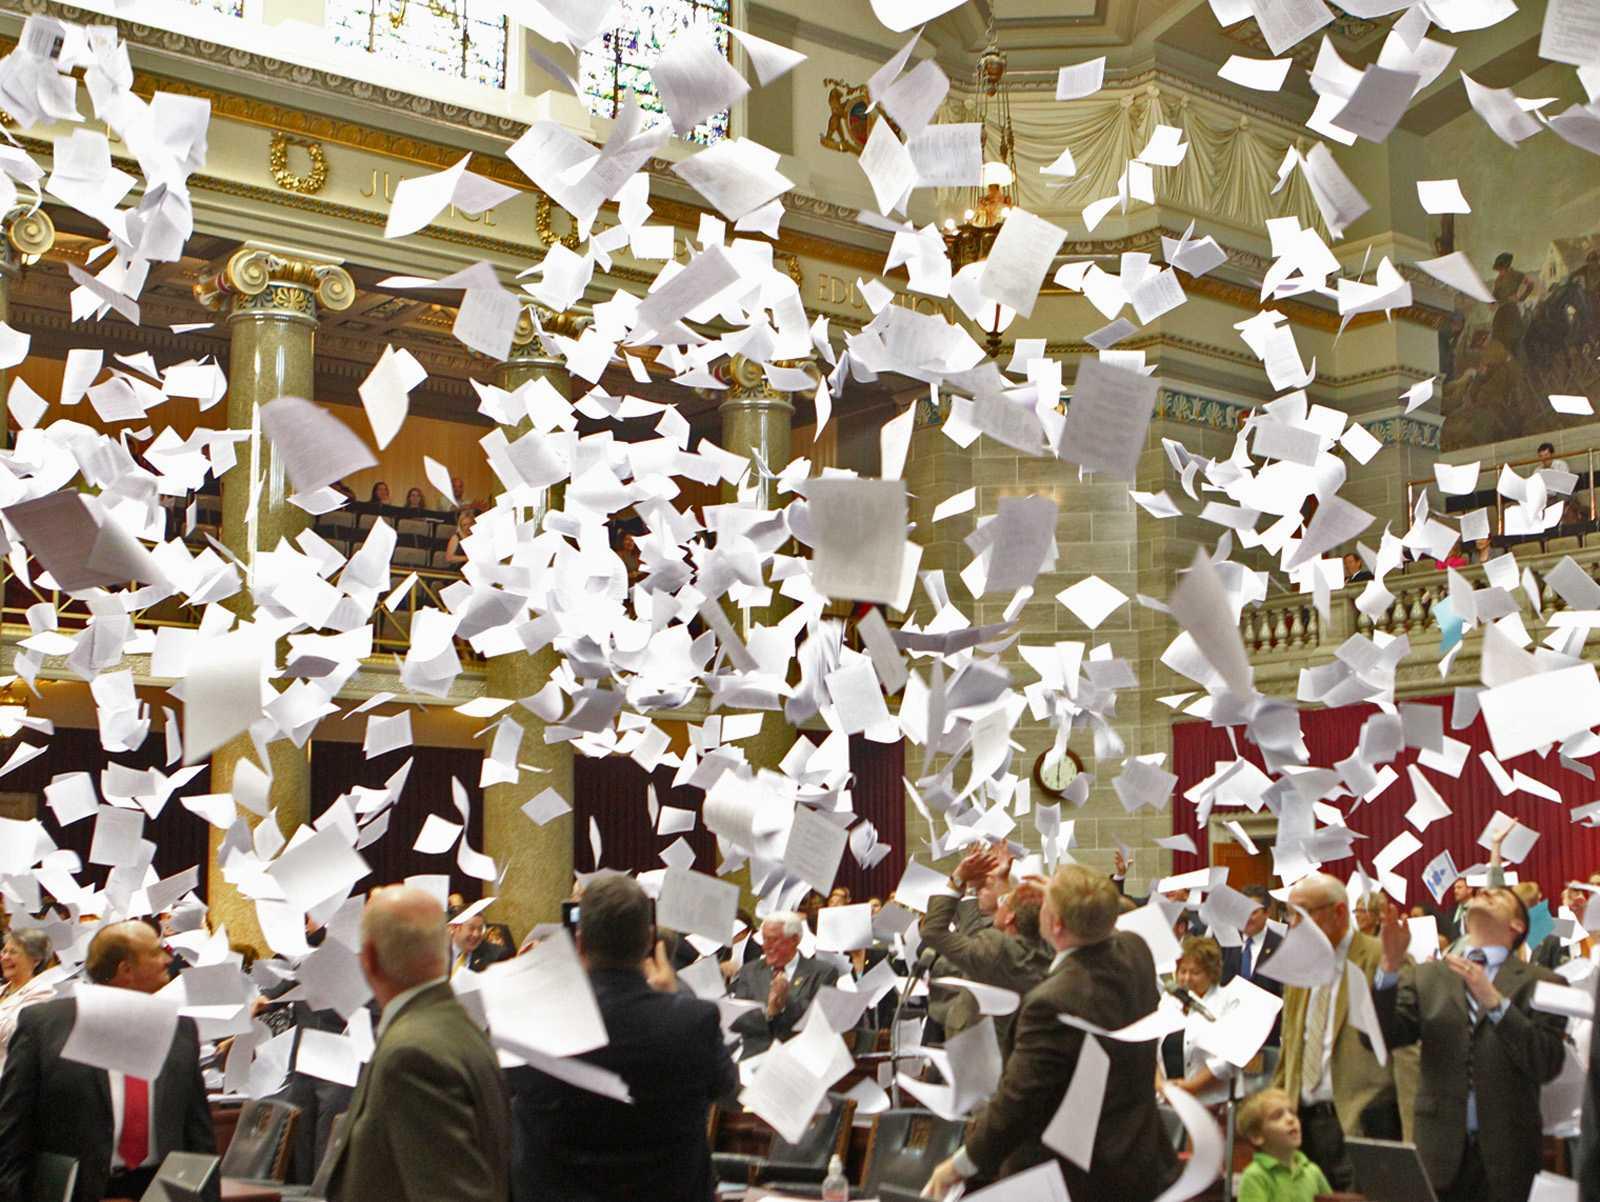 Photo courtesy of watchdog.org